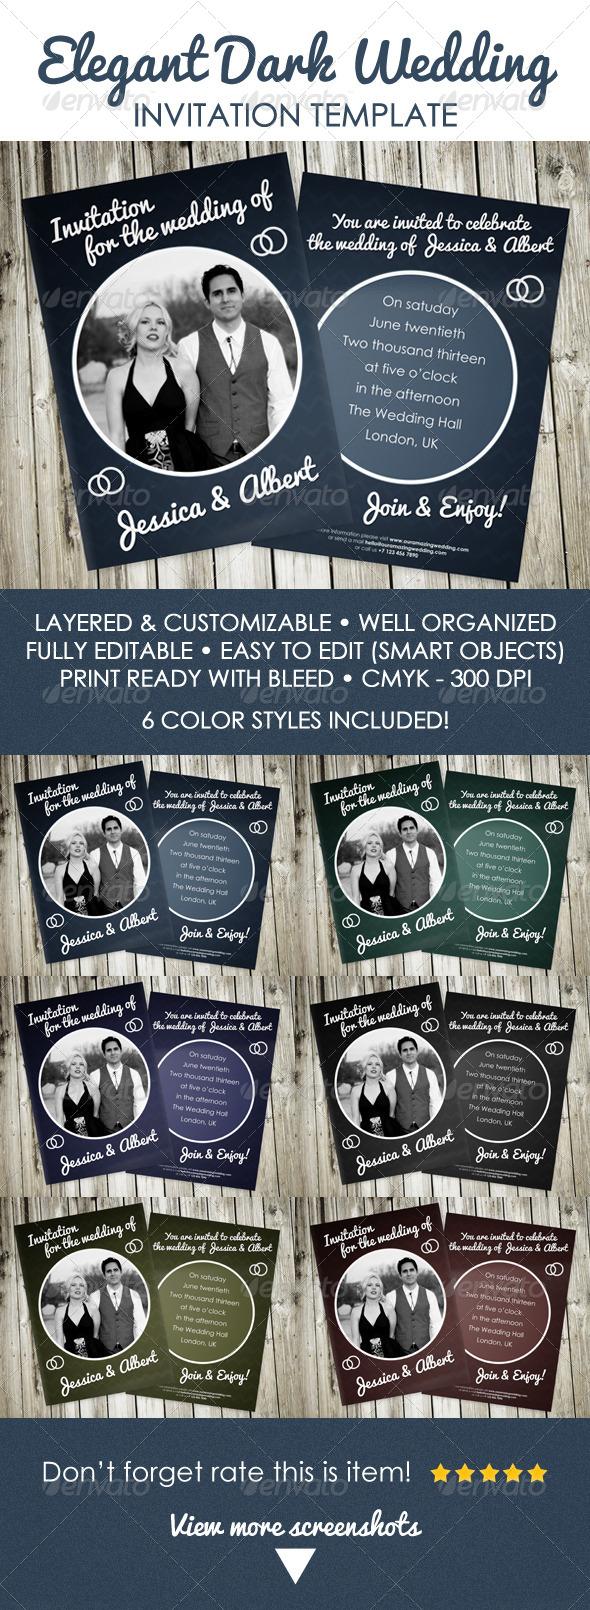 Elegant Dark Wedding Invitation - Weddings Cards & Invites